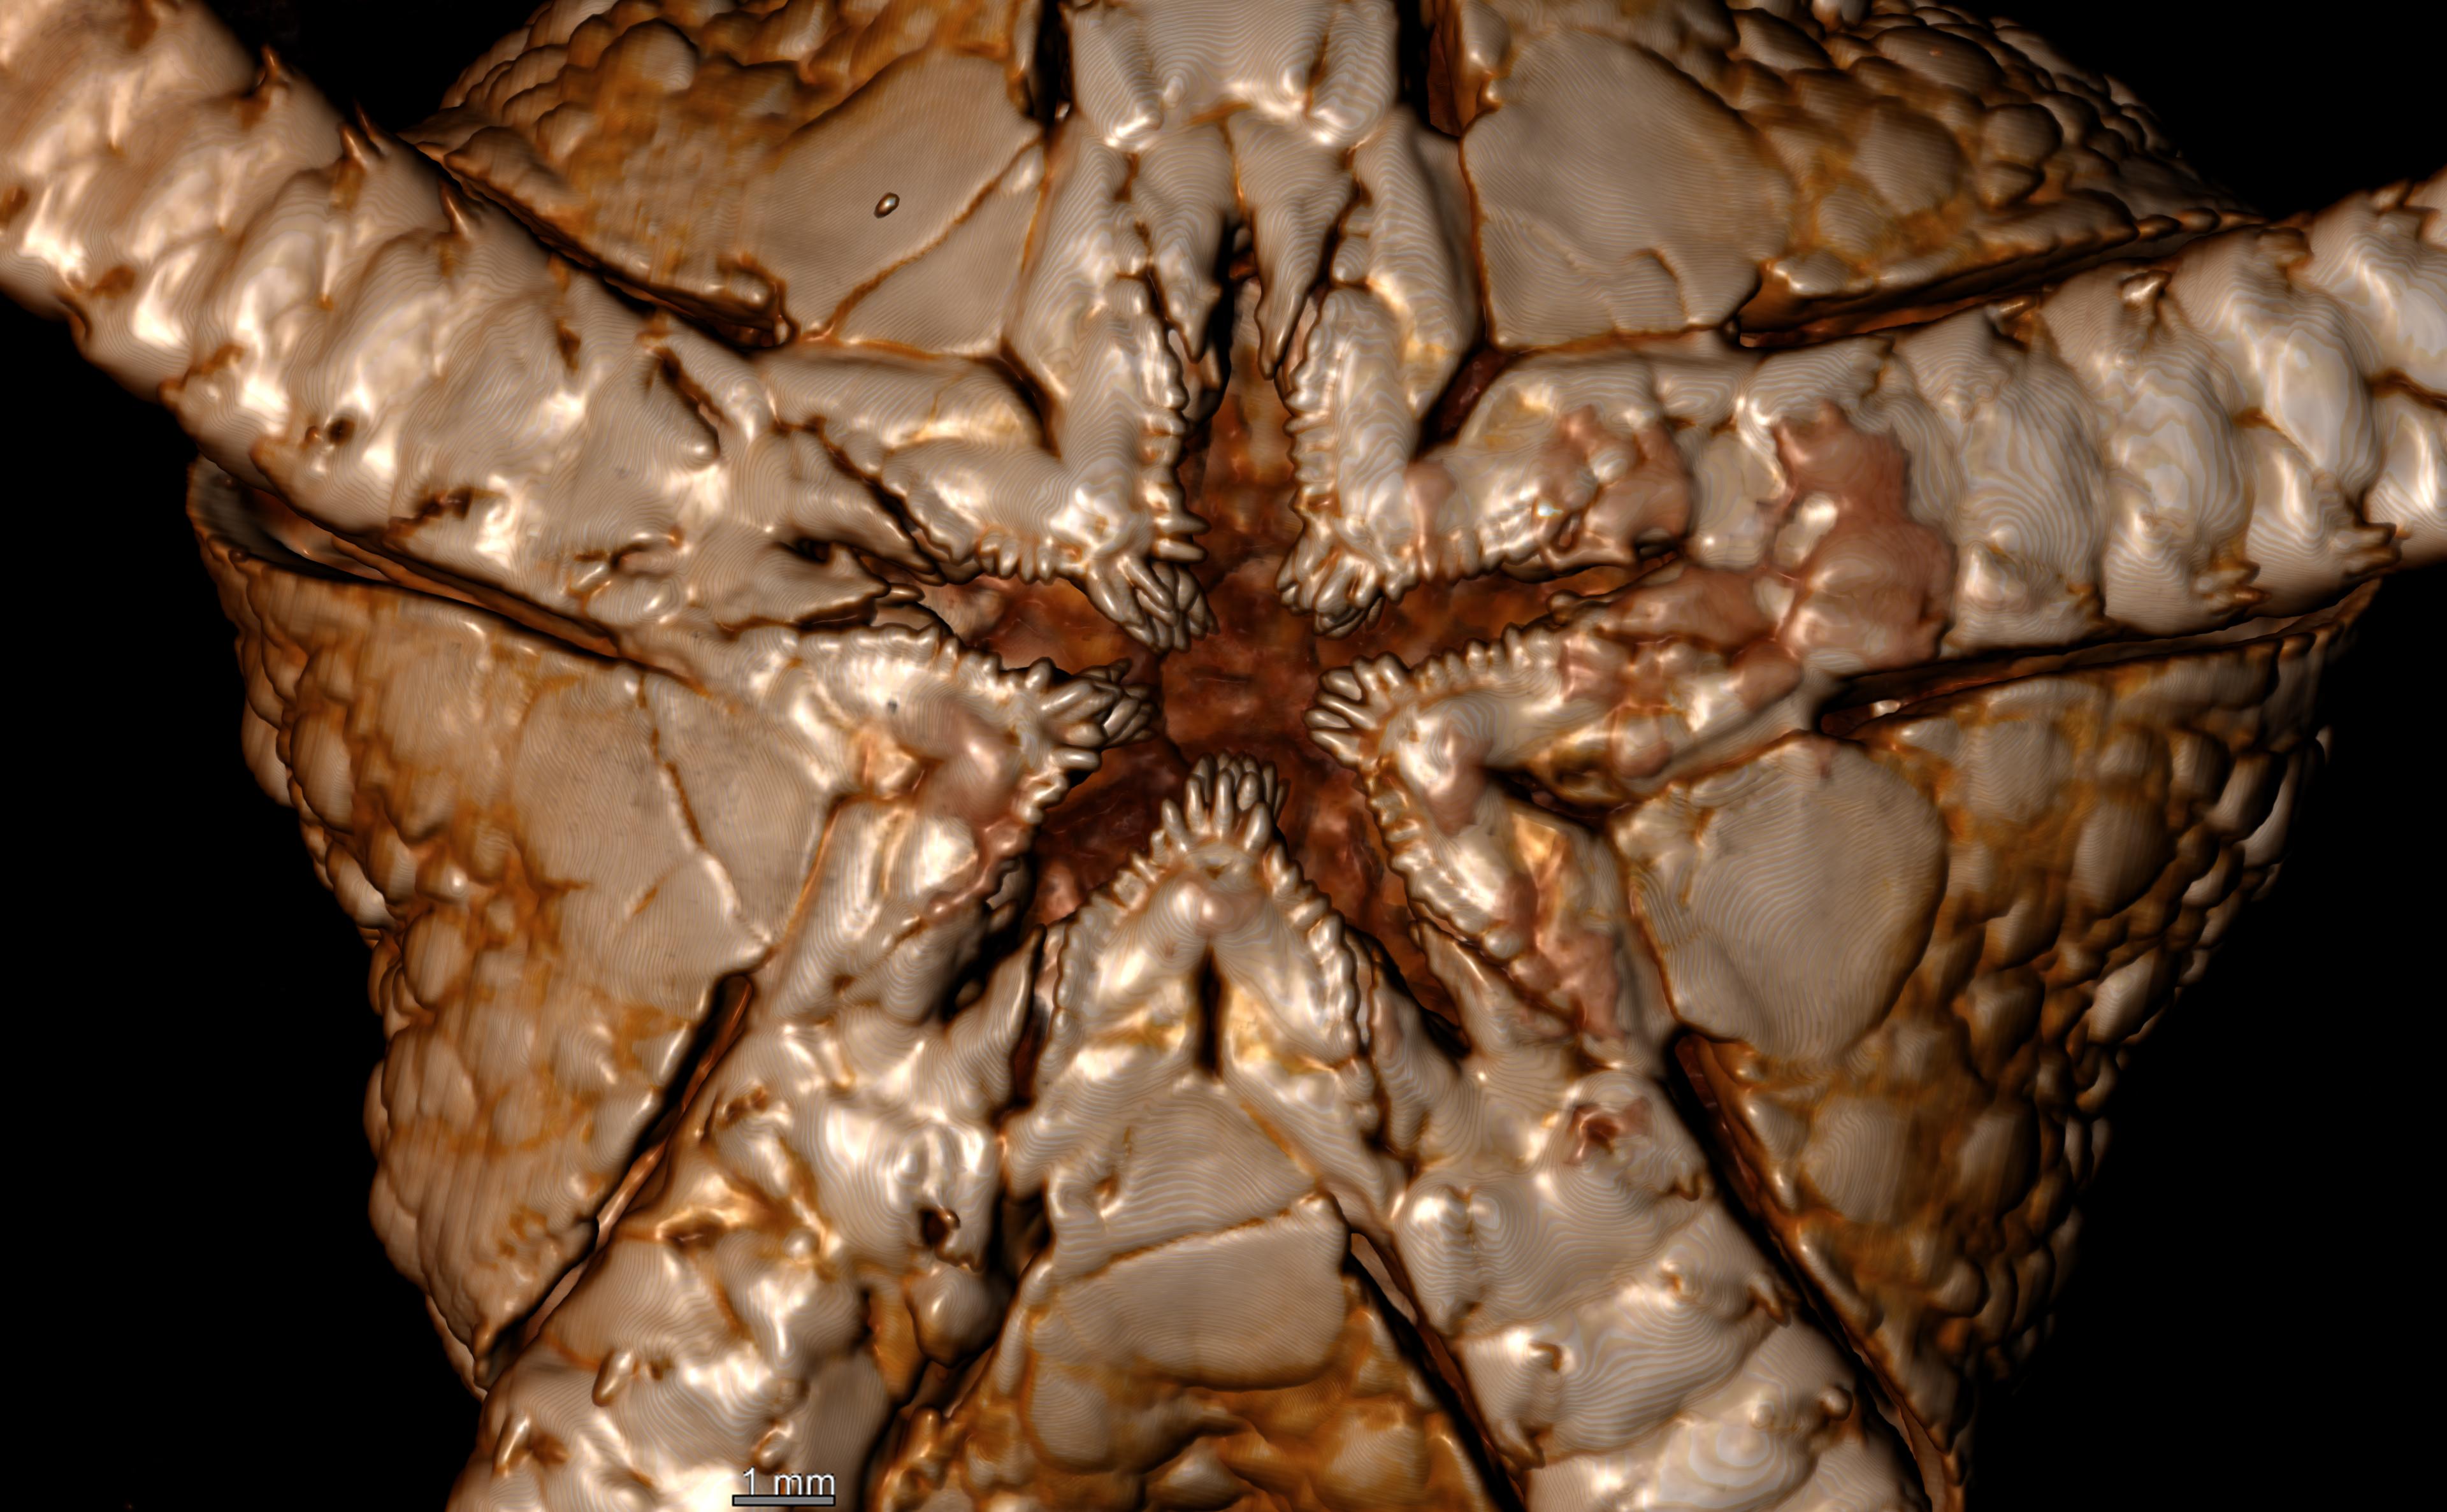 BE-RBINS-INV HOLOTYPE OPH.151 Ophioglypha carinifera ORAL FIELD.jpg